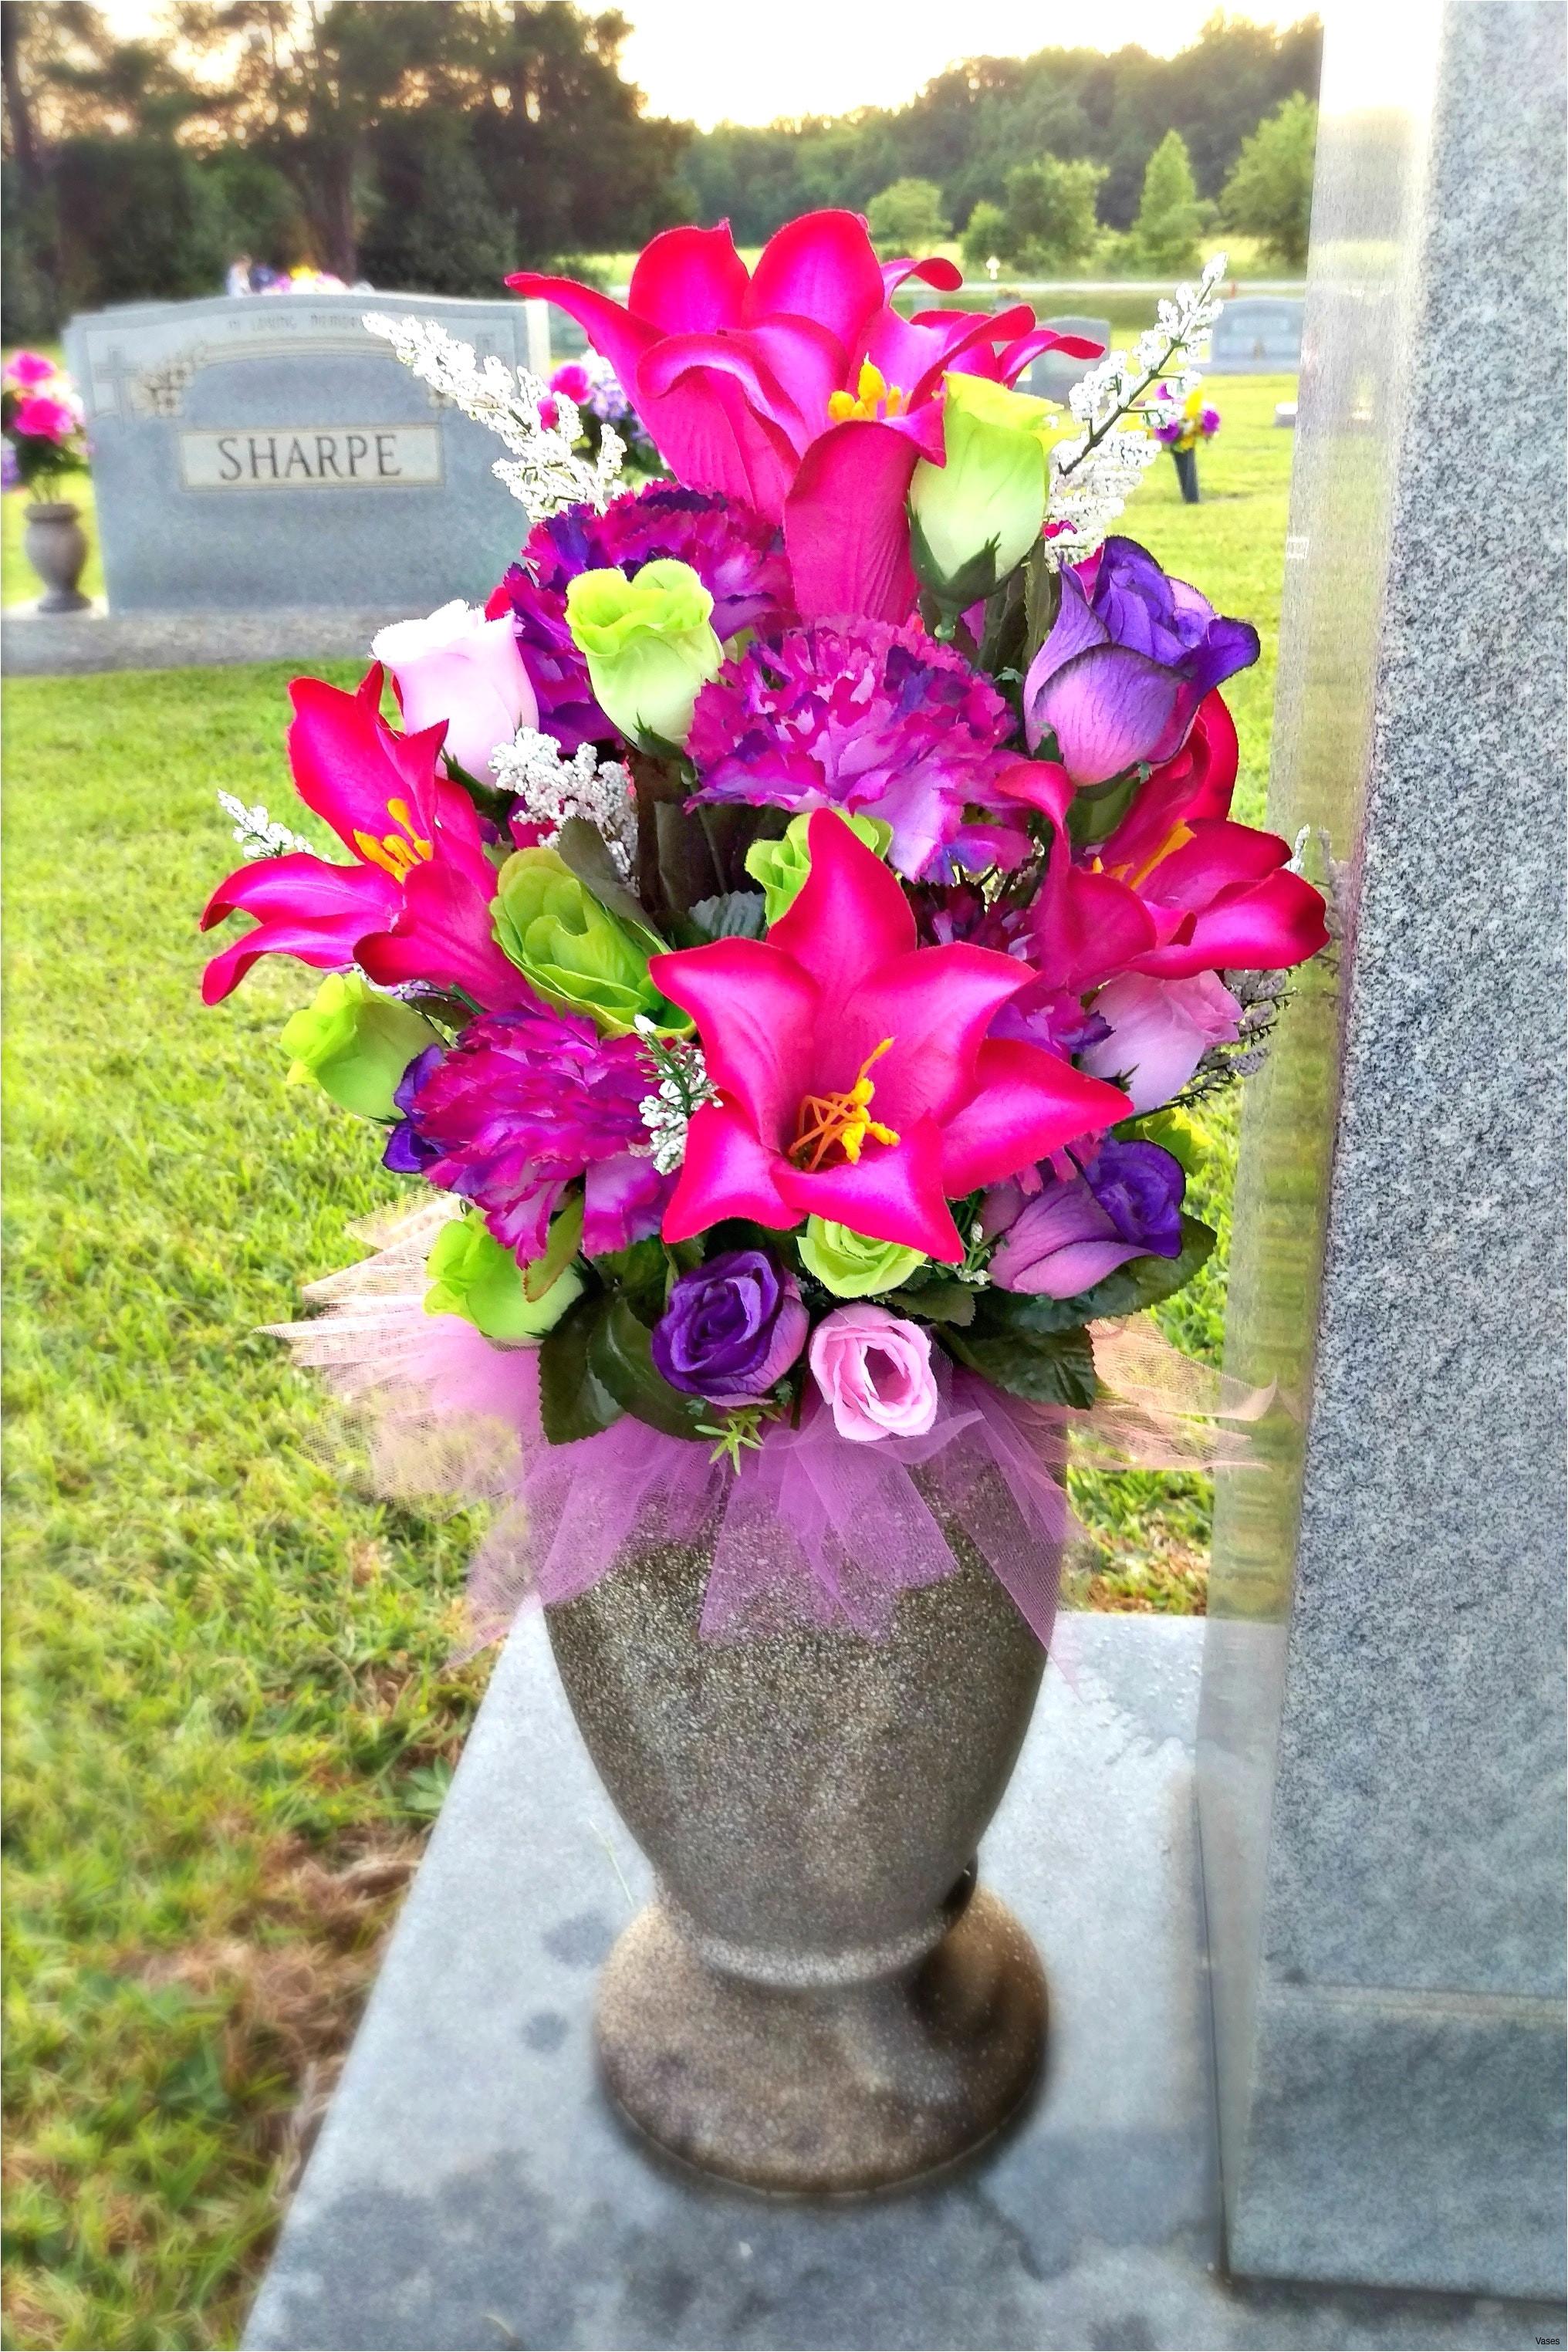 paper vase craft of cemetery decoration ideas bradshomefurnishings regarding cemetery decoration ideas flower vase decoration ideas awesome vases grave flower vase